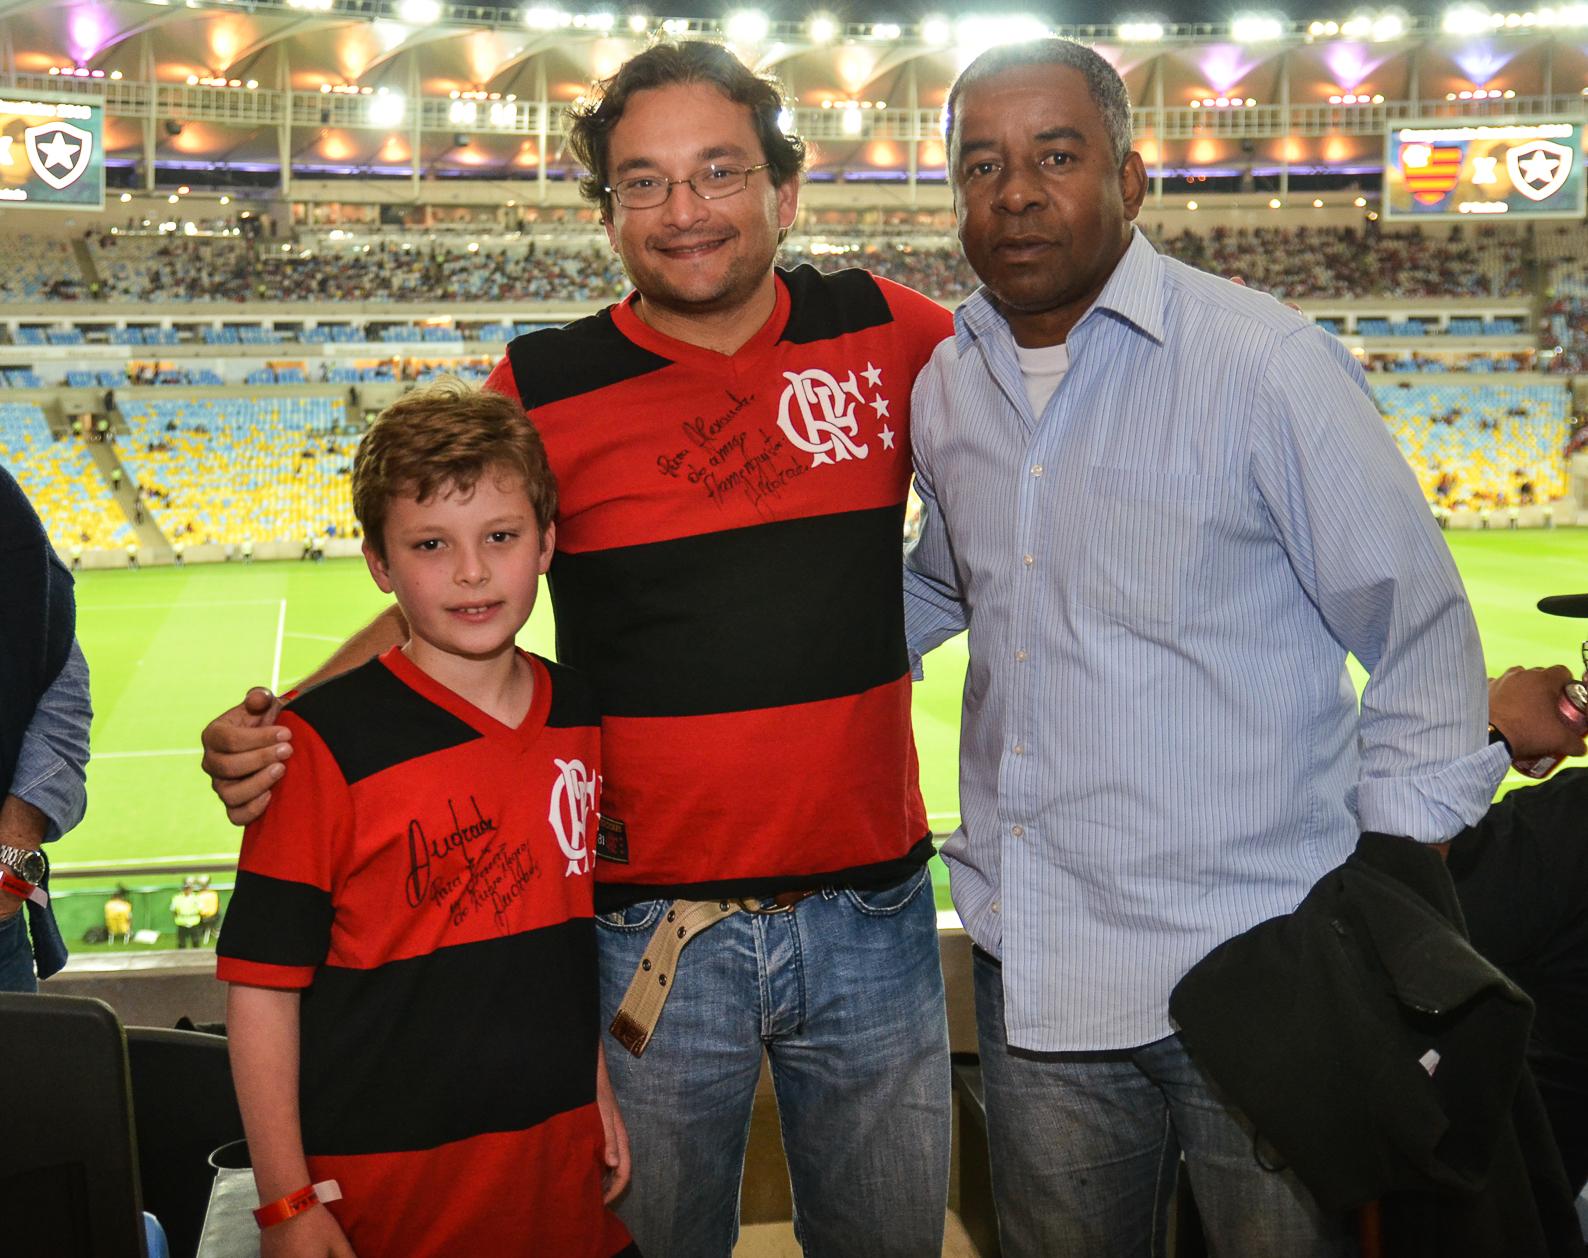 Accenture Football Club Flamengo x Botafogo 28072013 47